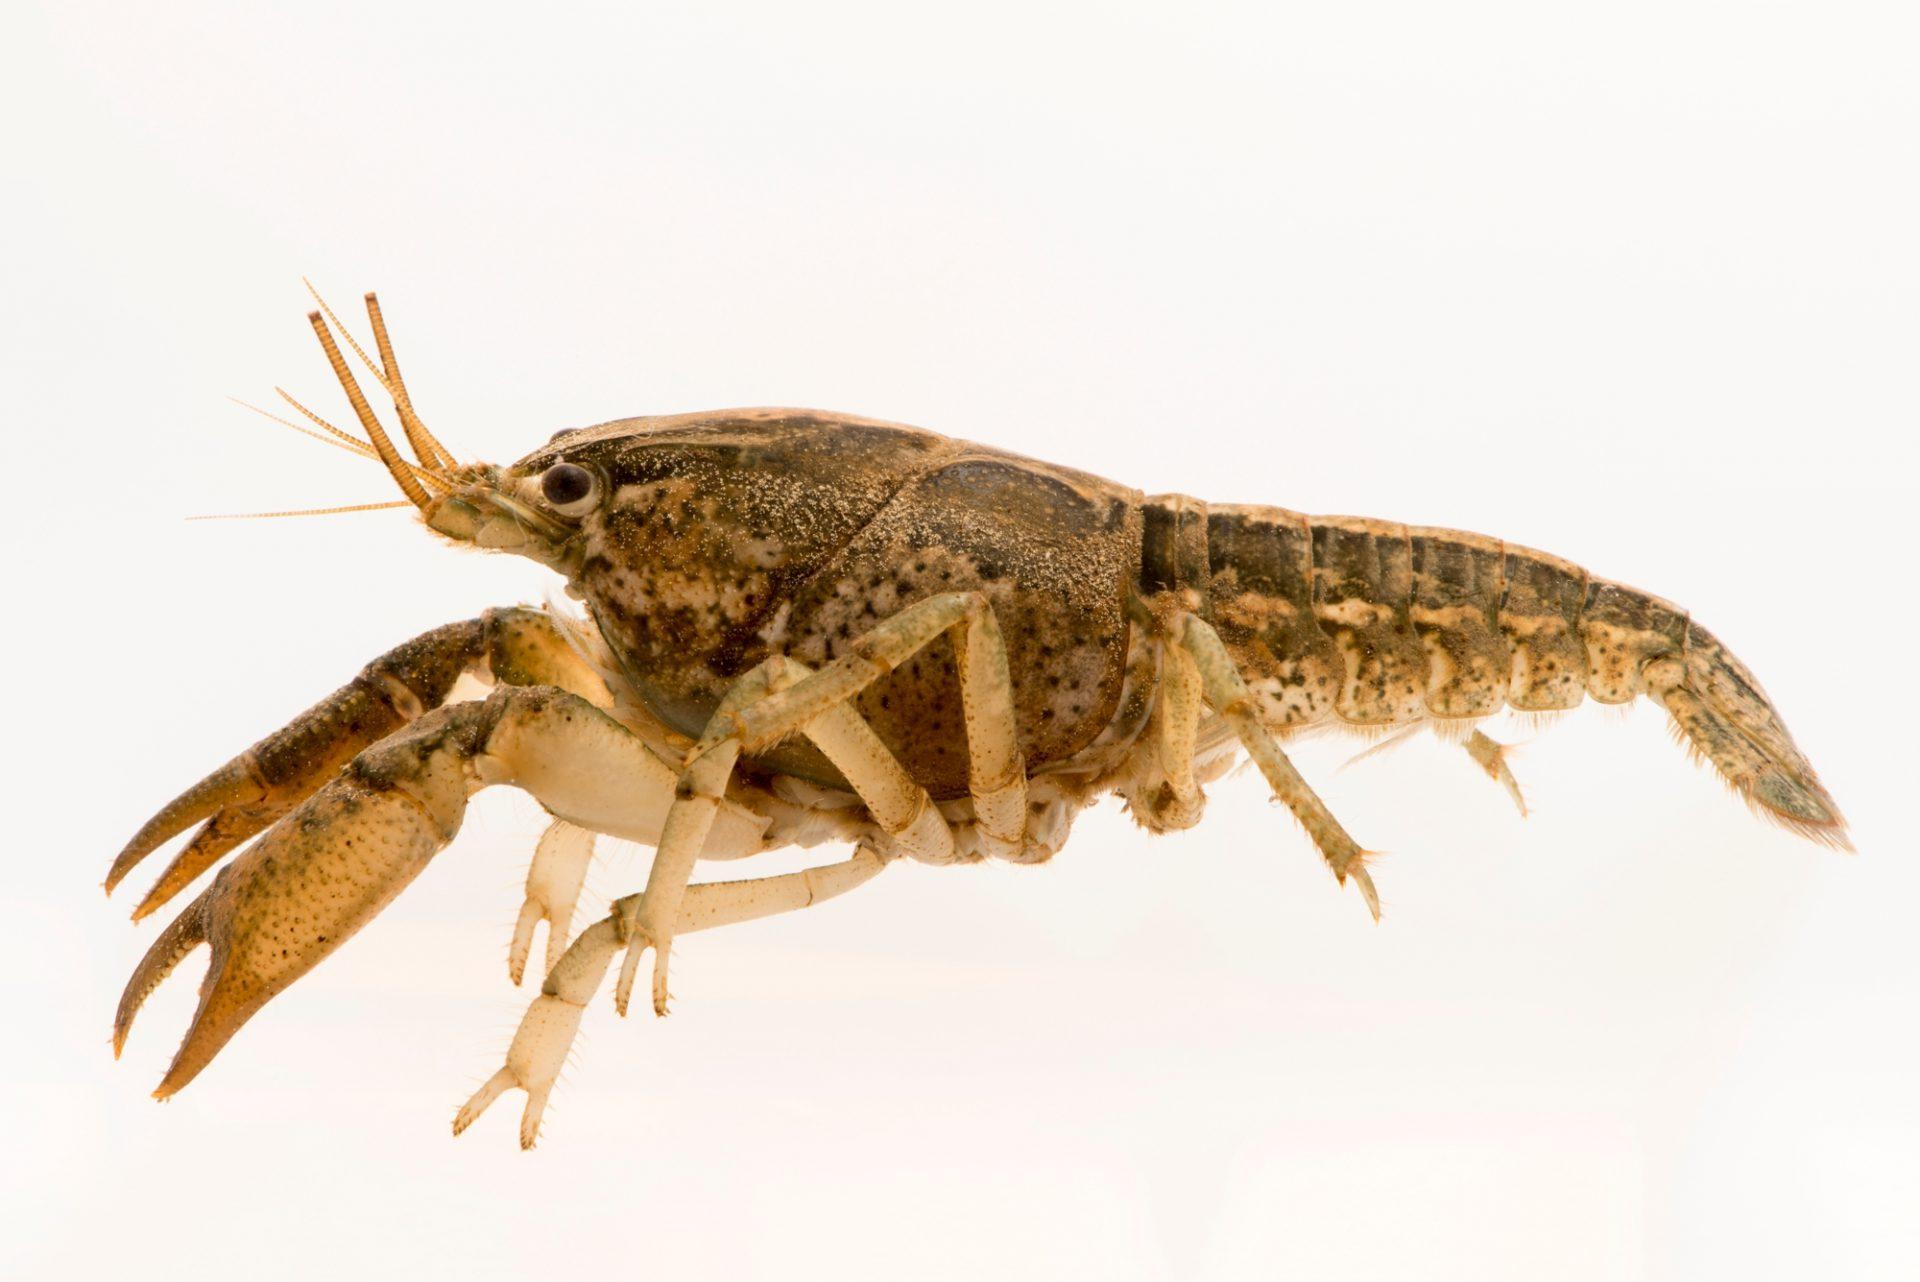 Photo: Coastal flatwoods crayfish (Procambarus apalachicolae) caught in the wild near Panama City, in Bay County, Florida.